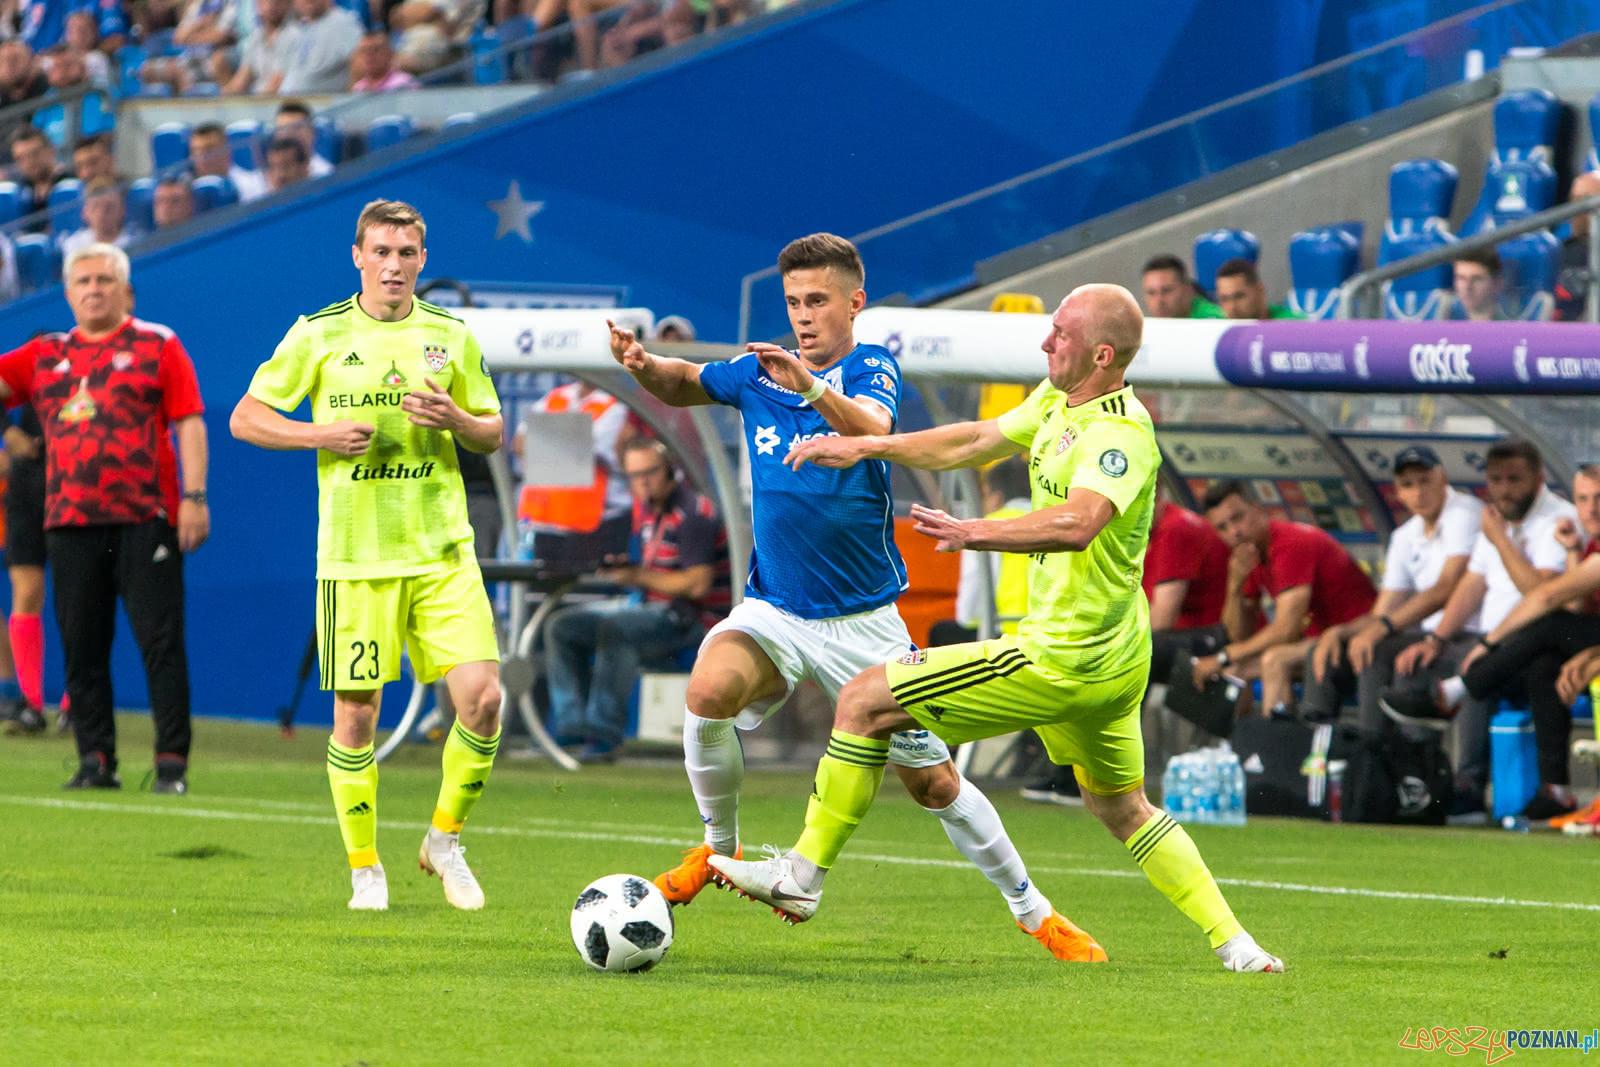 Lech Poznań - FC Shakhtyor Soligorsk (Vladimir Kostevych)  Foto: lepszyPOZNAN.pl/Piotr Rychter